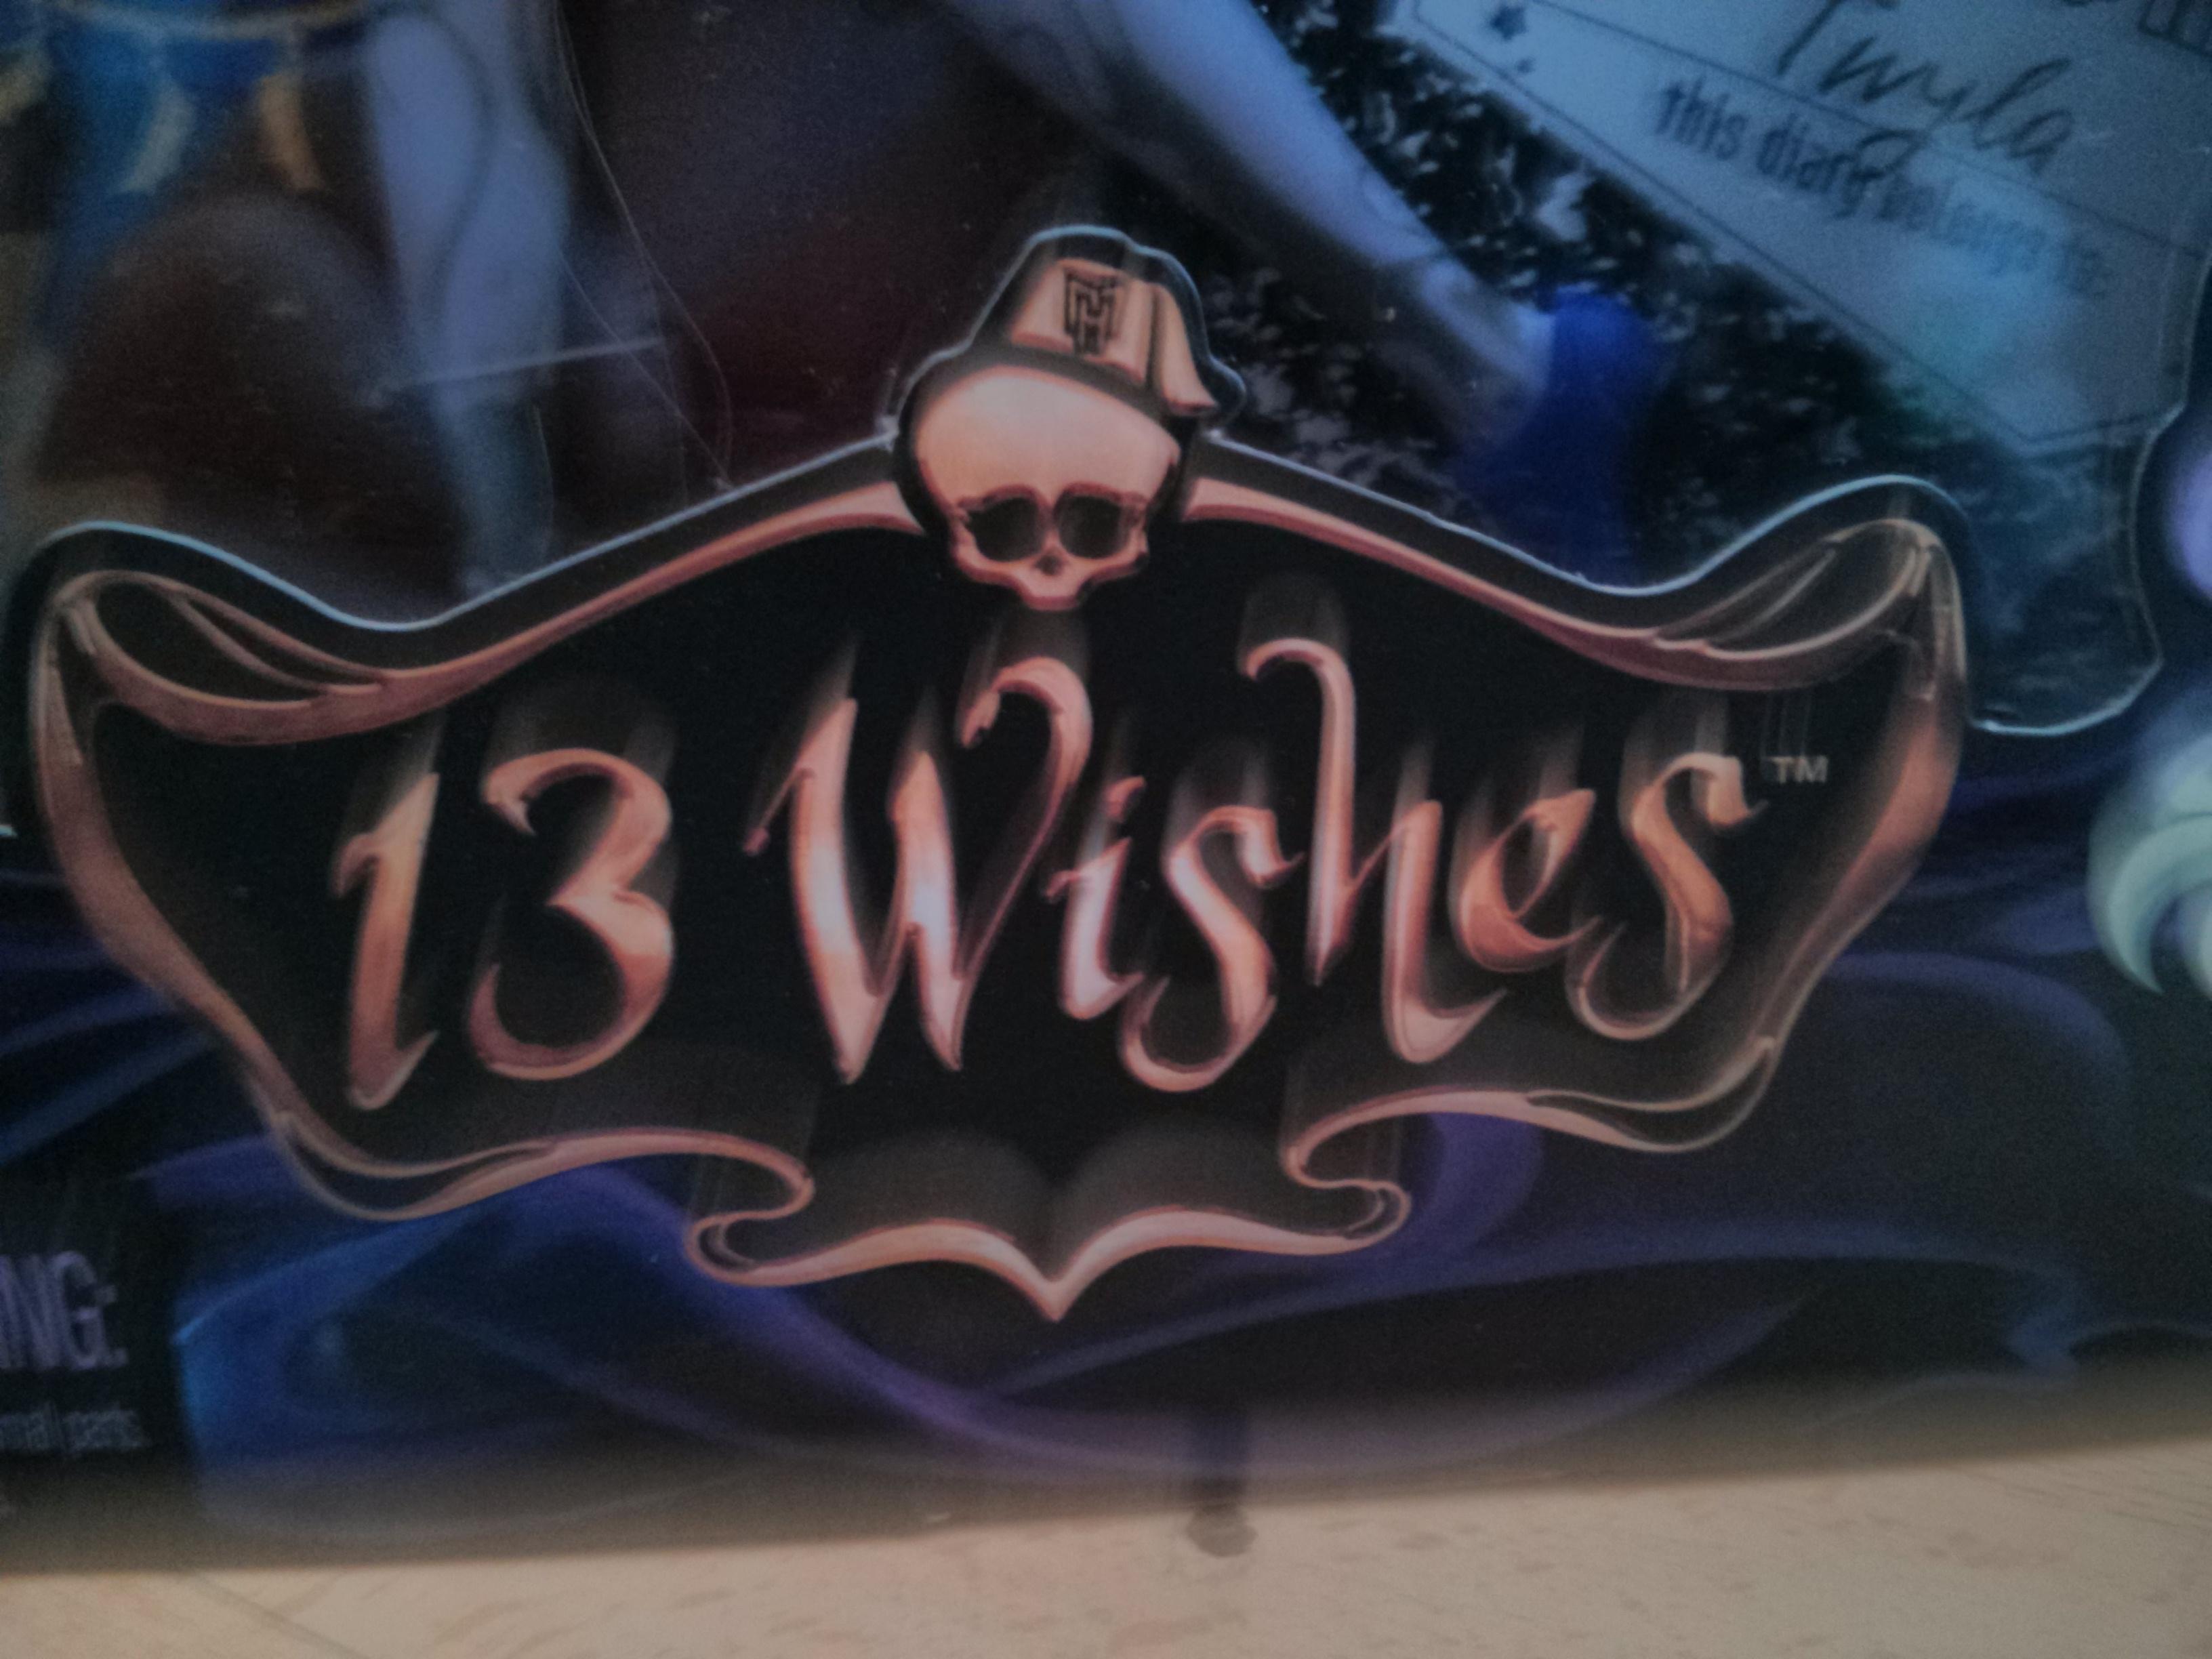 historia 13 wishes